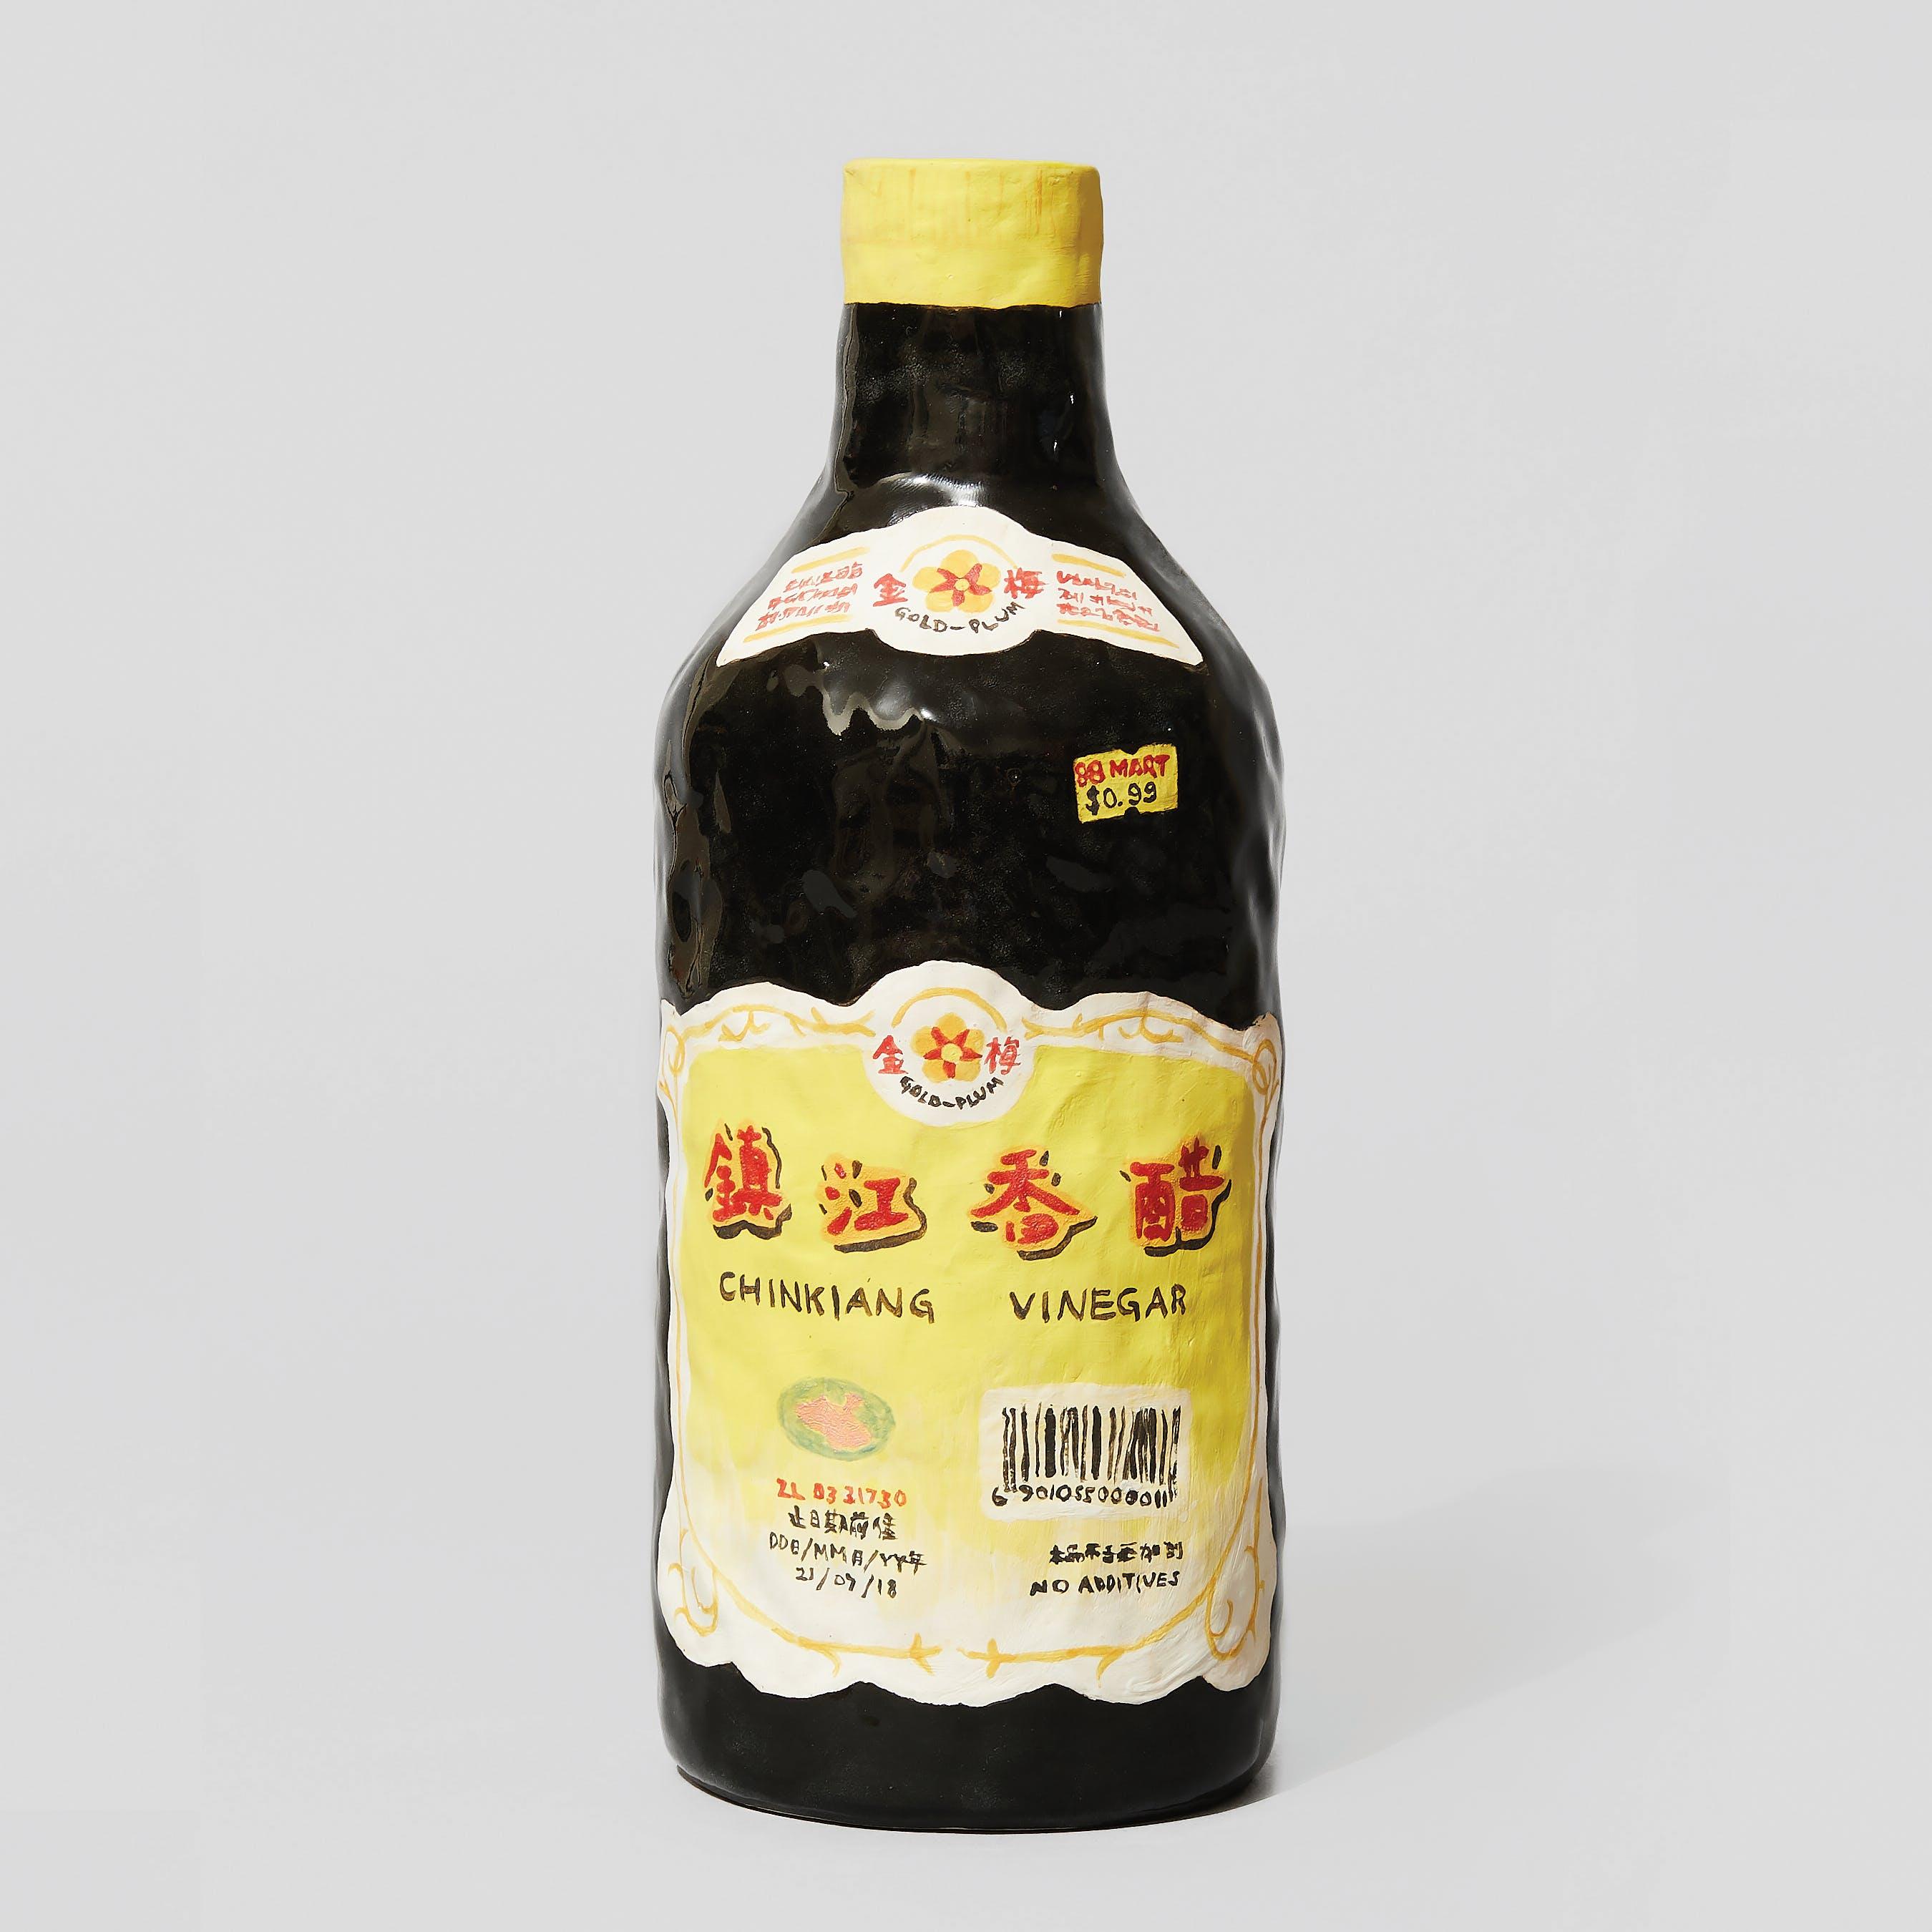 Ceramic replica of Gold Plum Chinkiang Black Vinegar